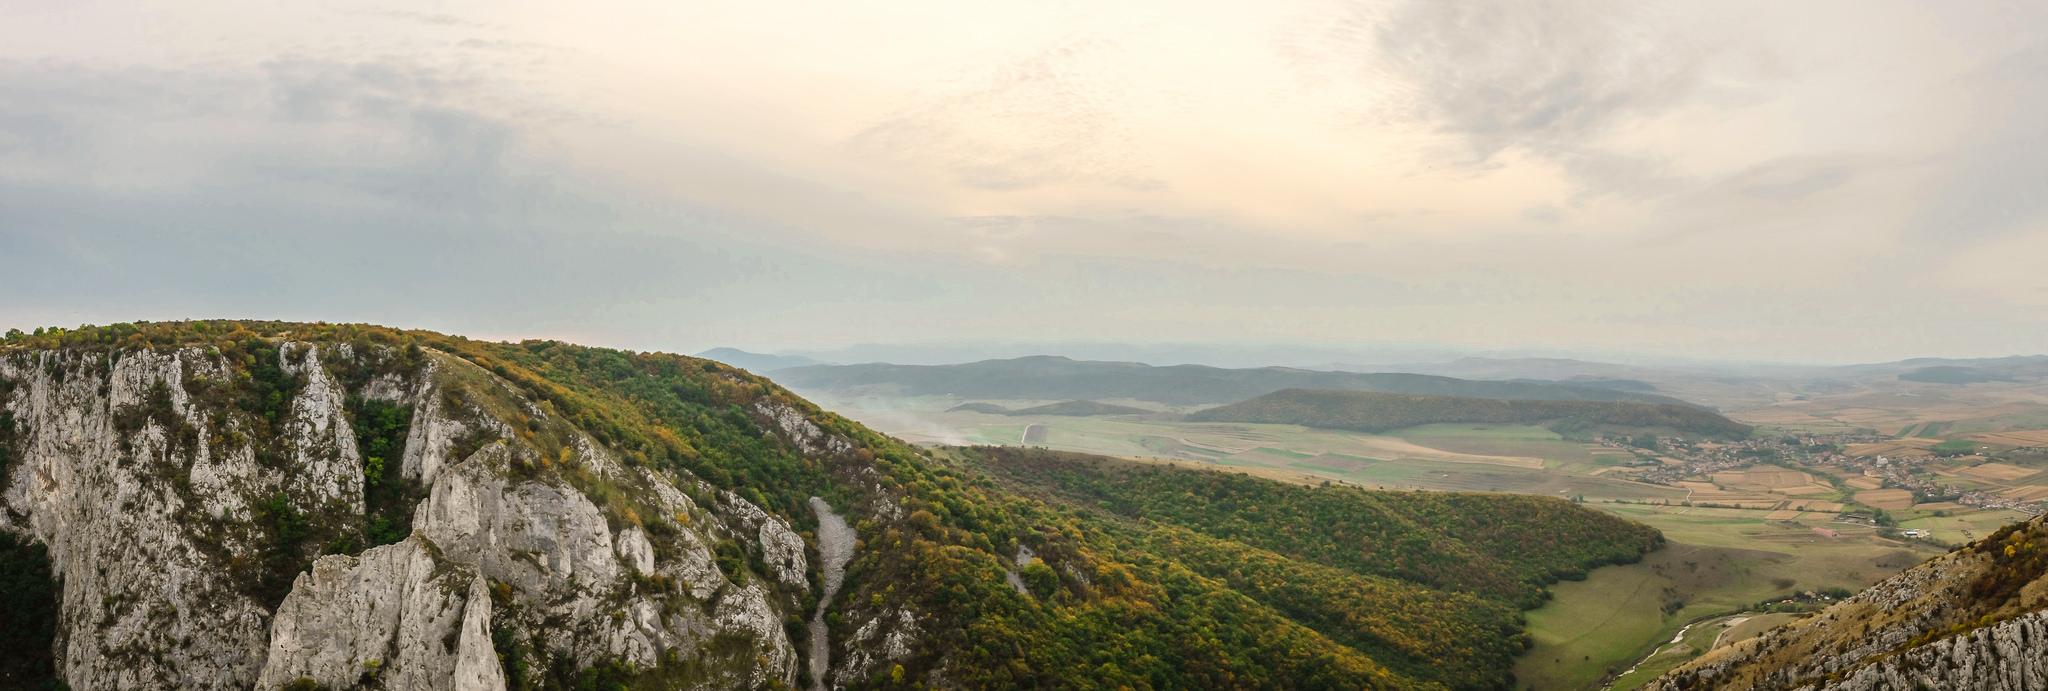 Rumunsko oplývá nádhernou krajinou, Sergey Norin